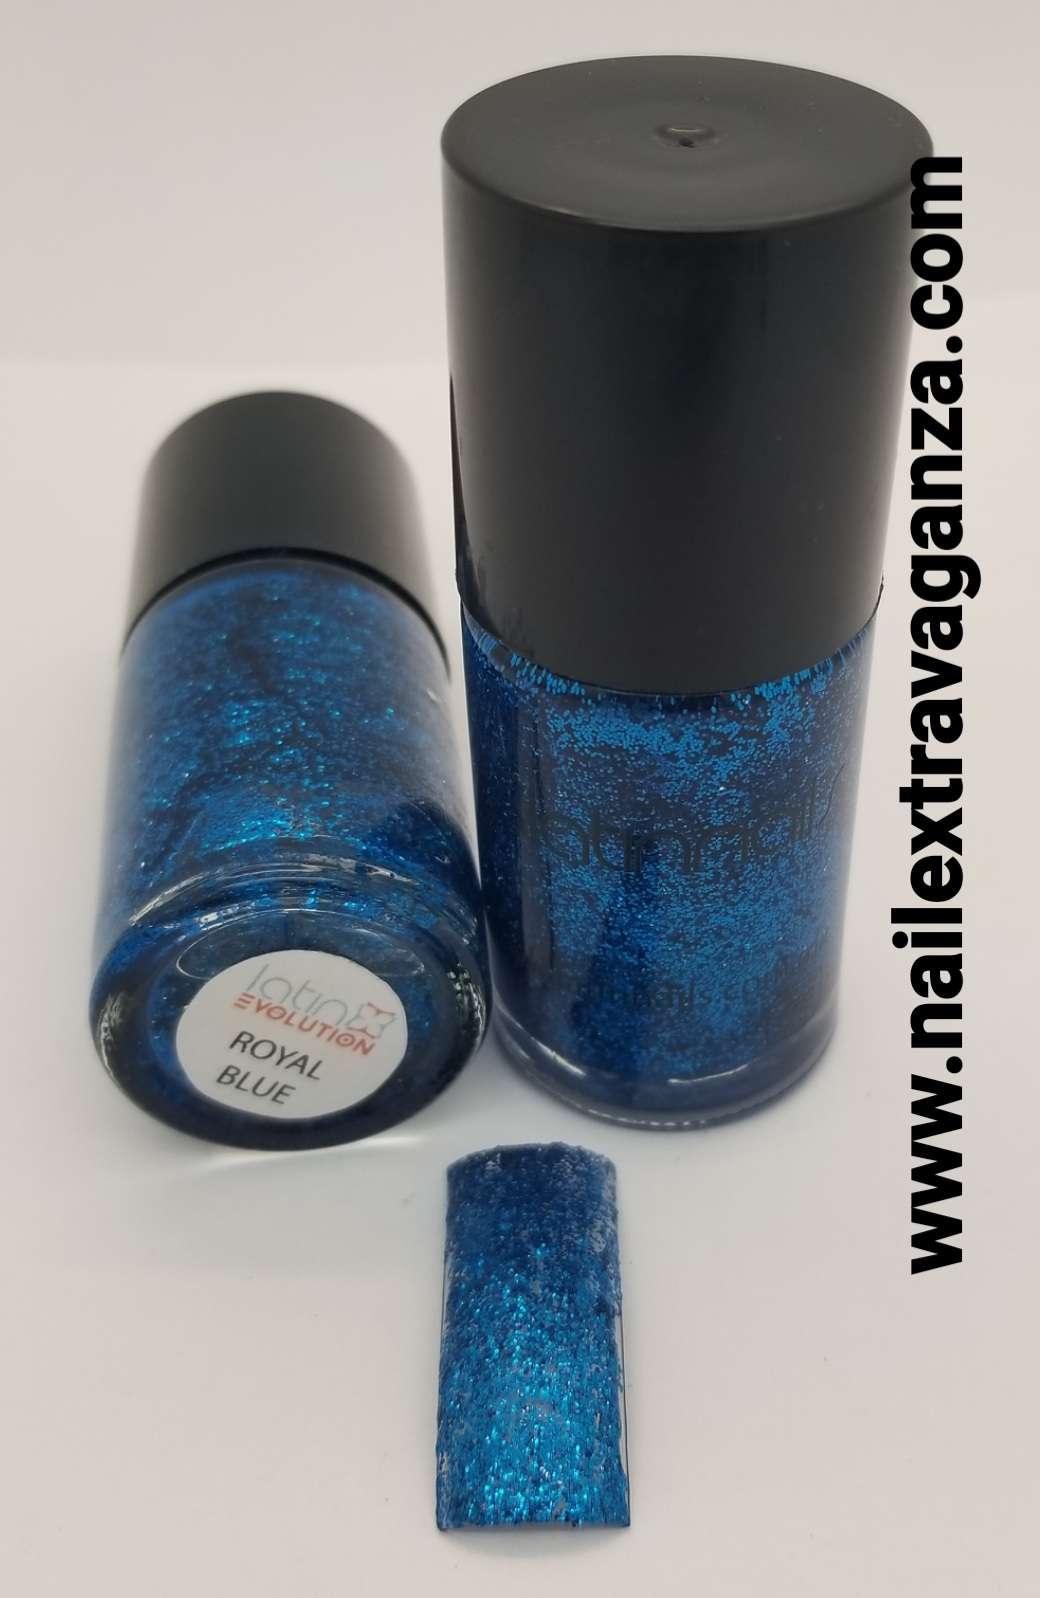 Latin Nails Glitter Royal Blue 15ml